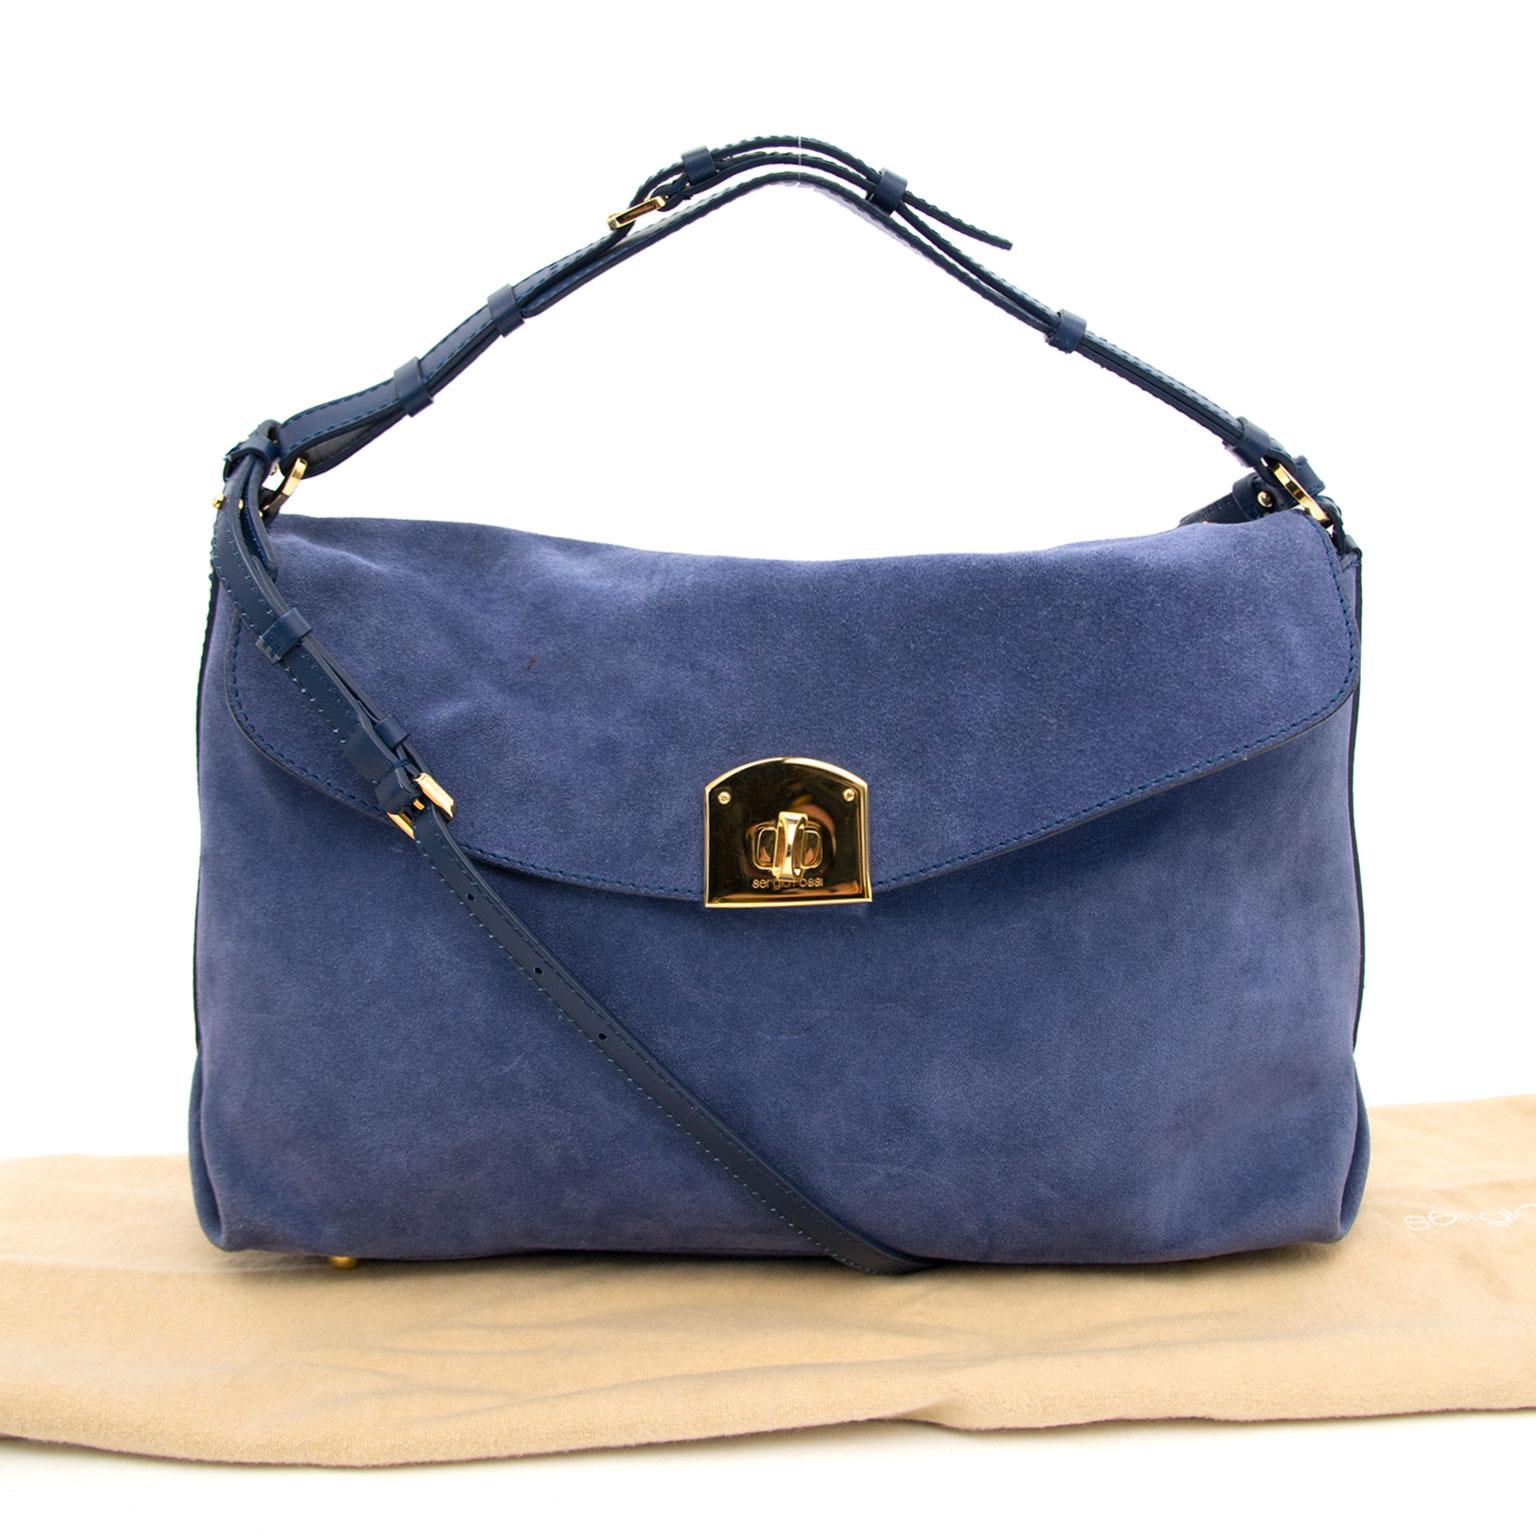 shop safe onilne at the best price you secondhand luxury Sergio Rossi Blue Shoulder Bag